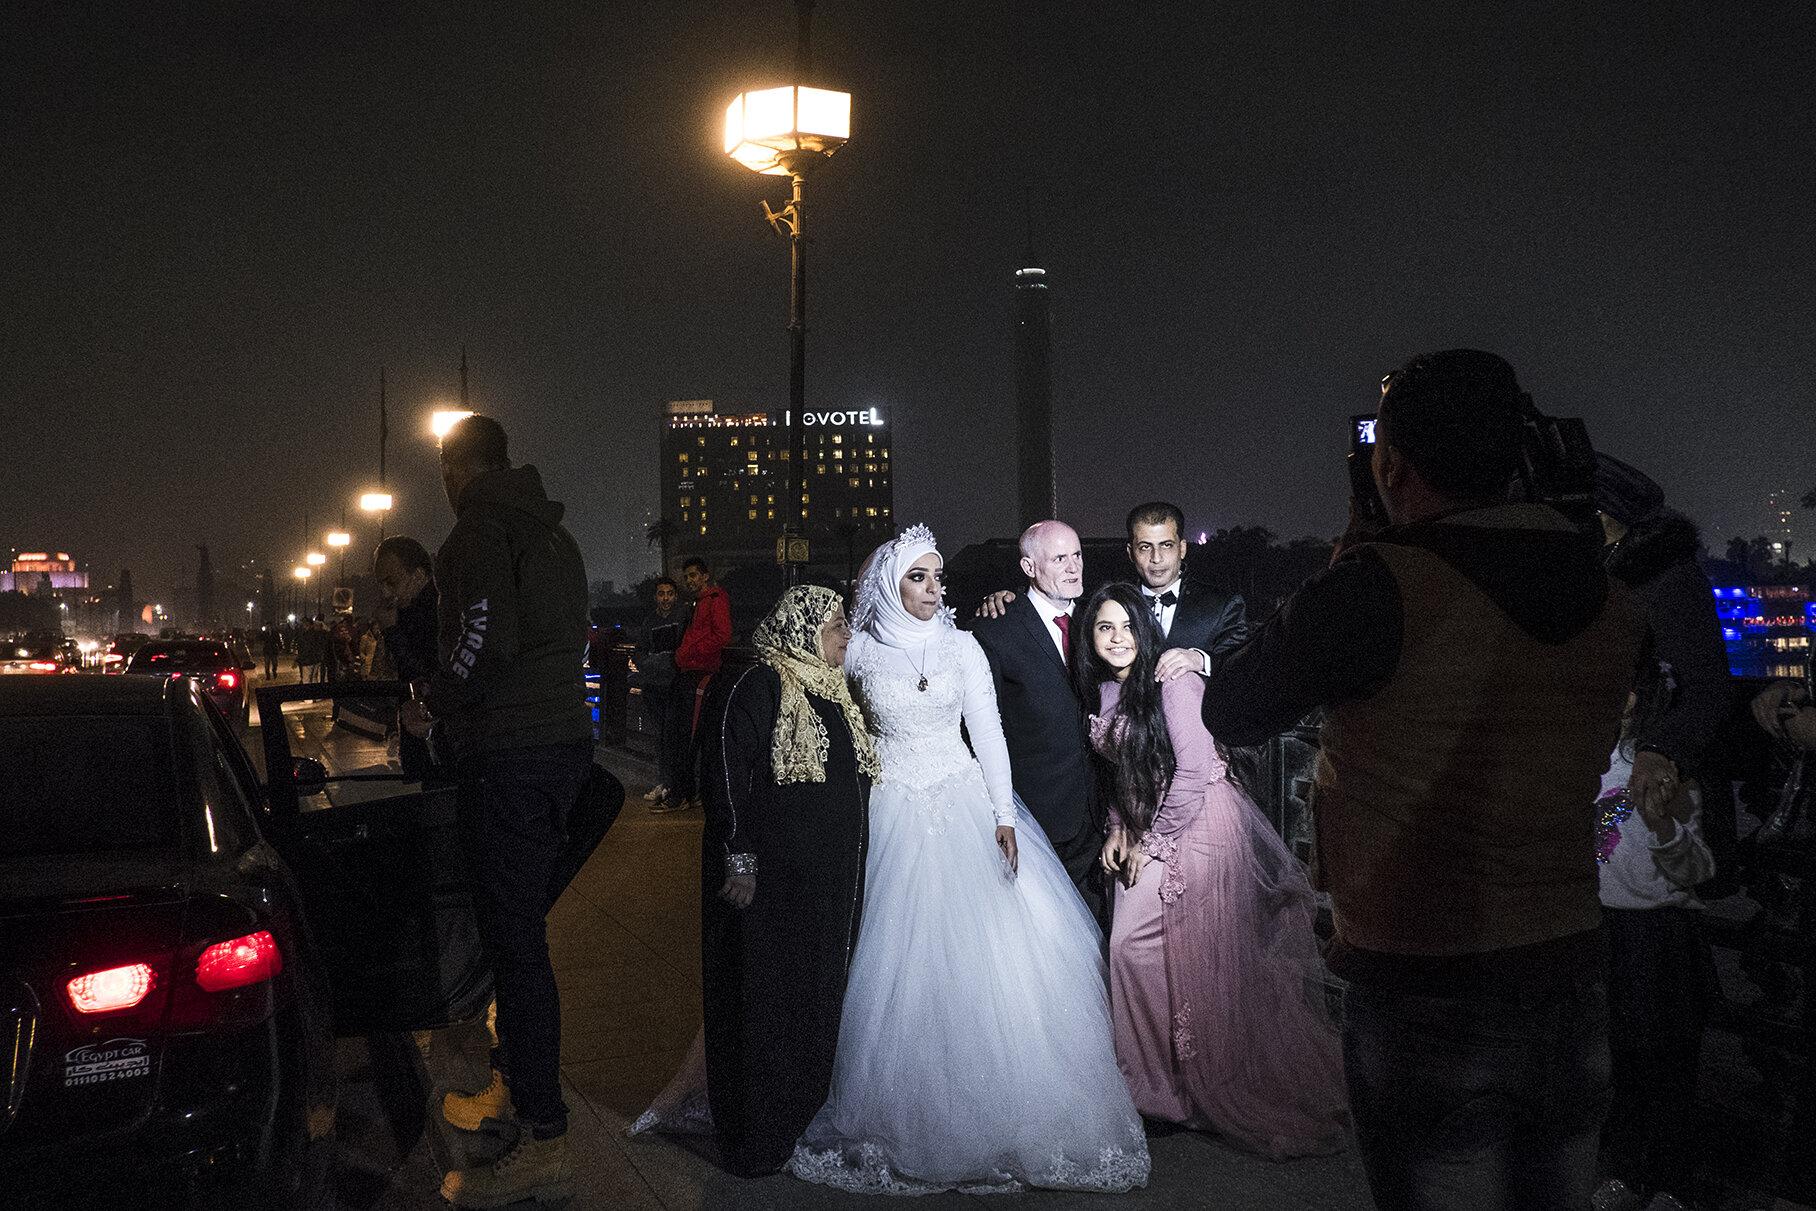 Egyptian girl marry Egypt: Ancient